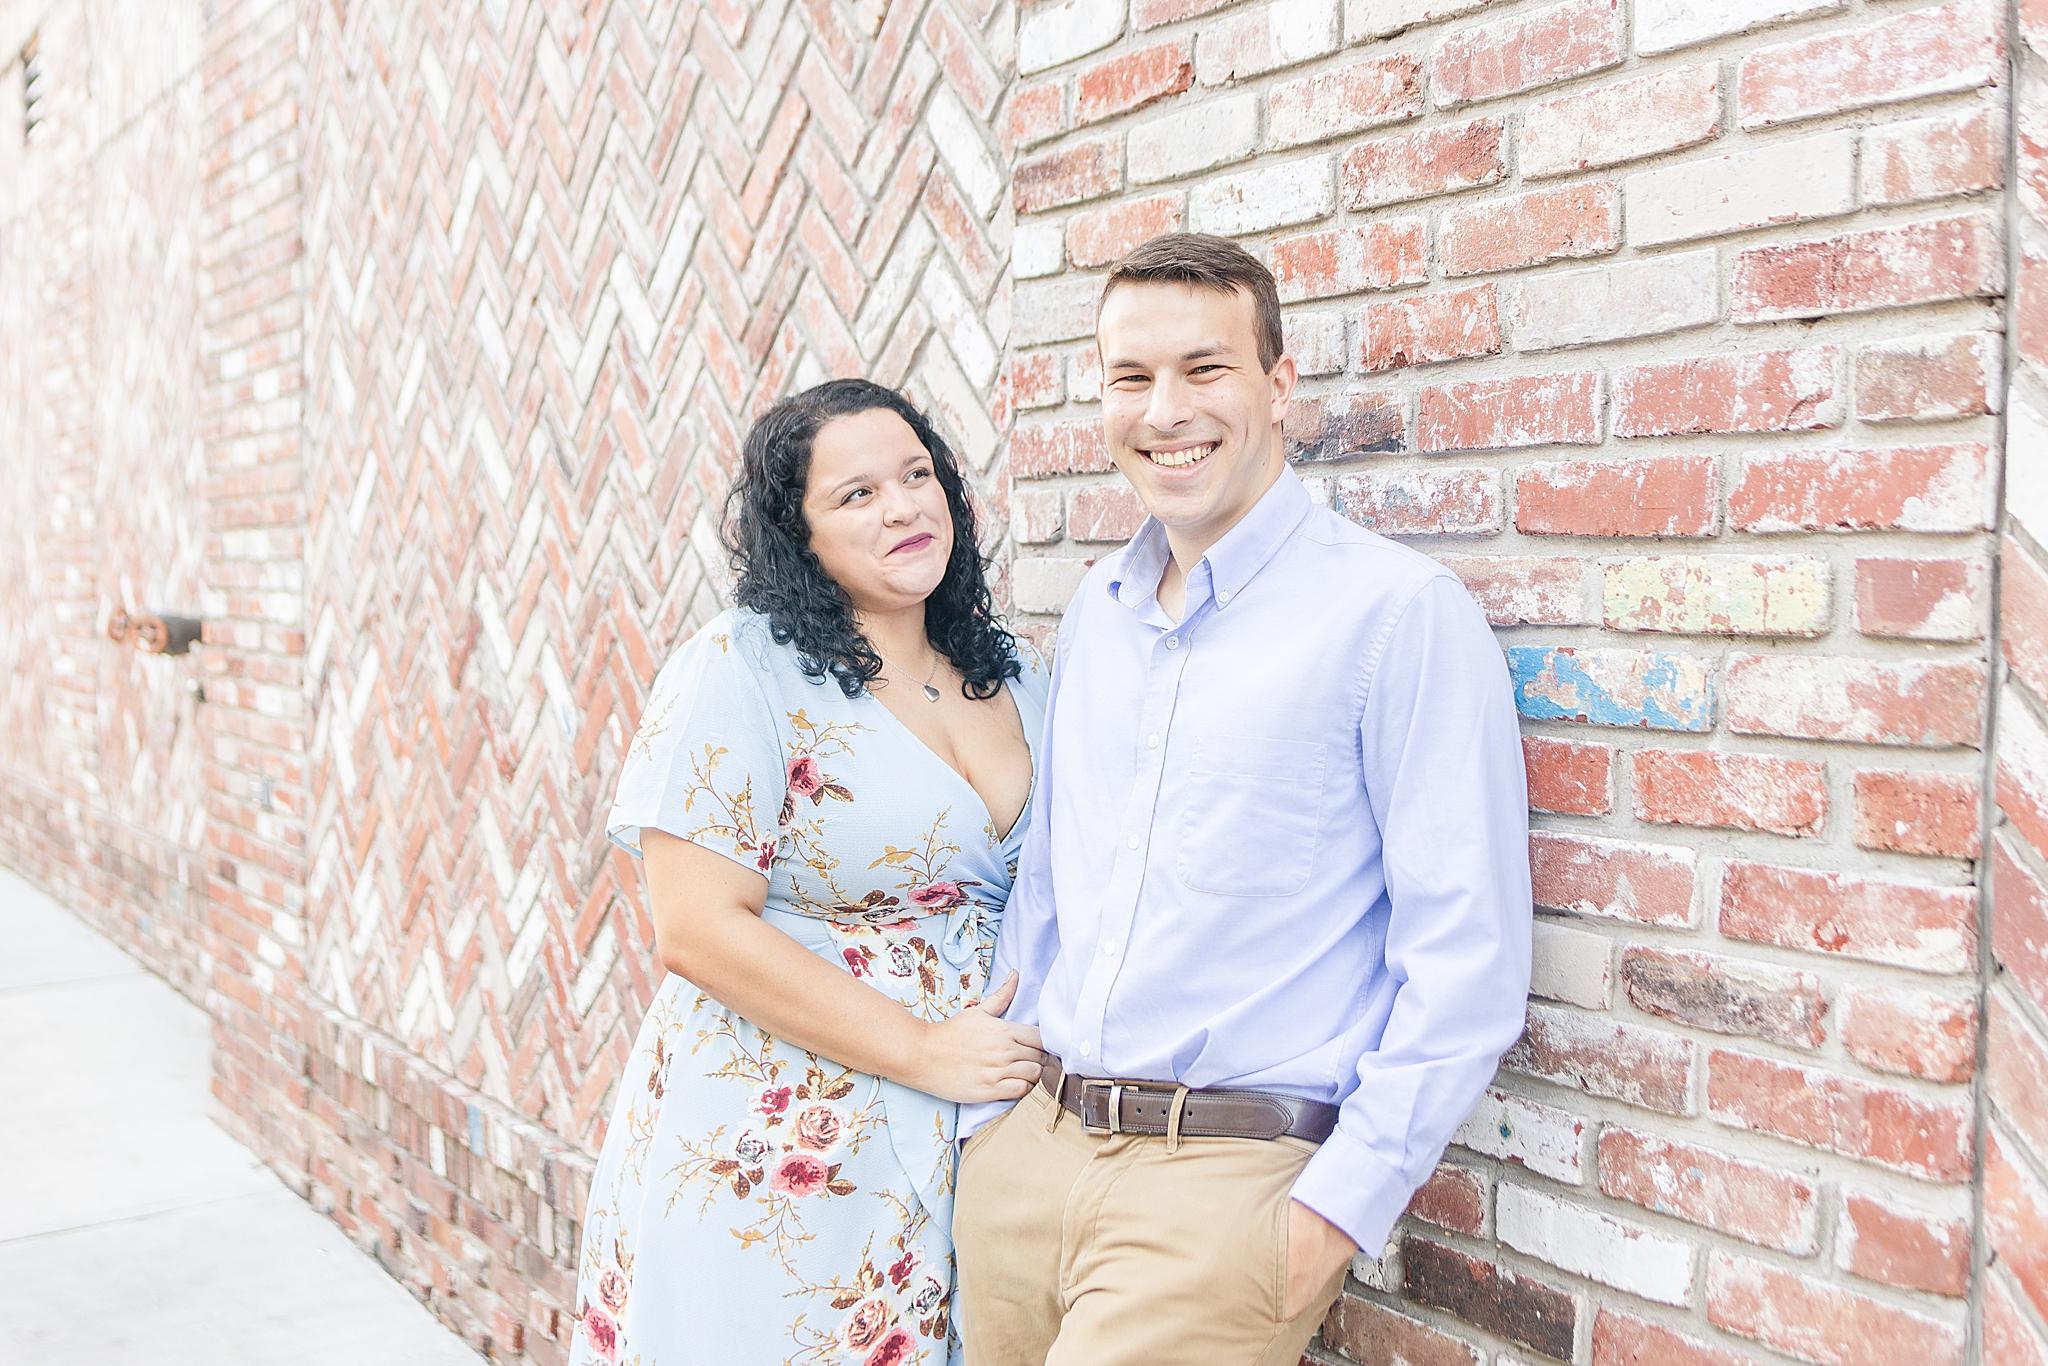 Fairhope AL engagement portraits along brick wall